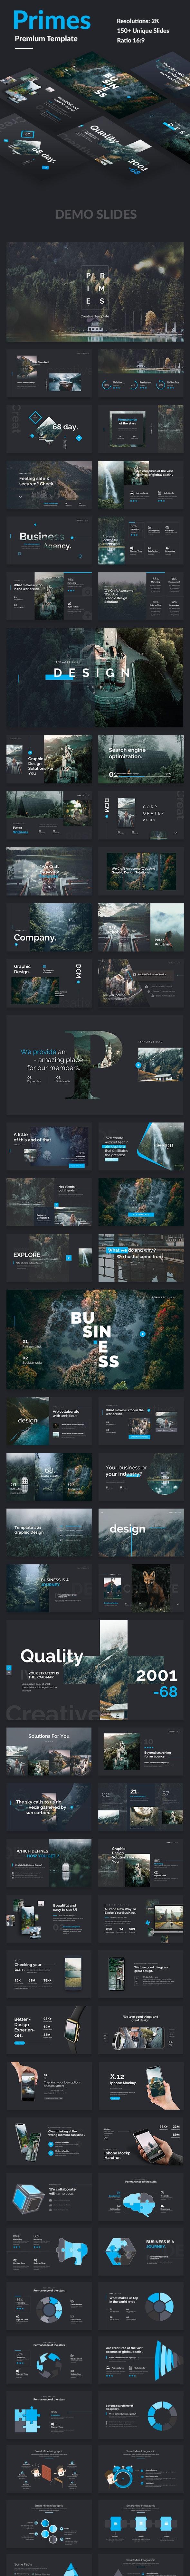 Primes Premium Keynote Template - Creative Keynote Templates